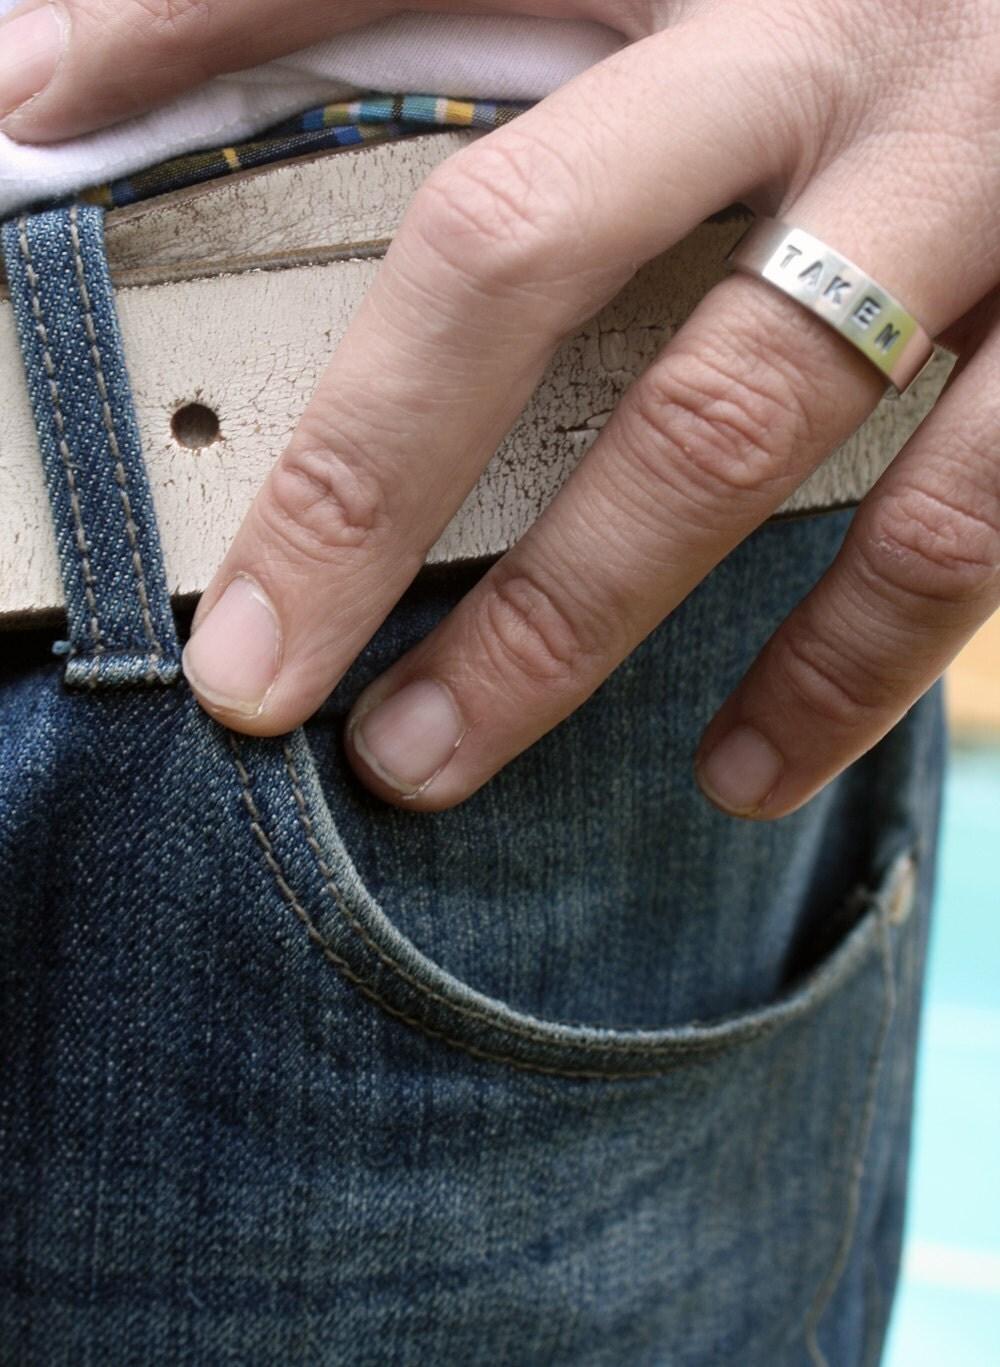 Unique Mens Wedding Ring  Taken Ring  Chunky Sterling. Cobra Snake Rings. Melania Trump's Wedding Rings. Atrocitus Rings. Popular Engagement Engagement Rings. Diamond Chip Engagement Rings. Starburst Engagement Rings. Name Engagement Rings. Cocktail Wedding Rings